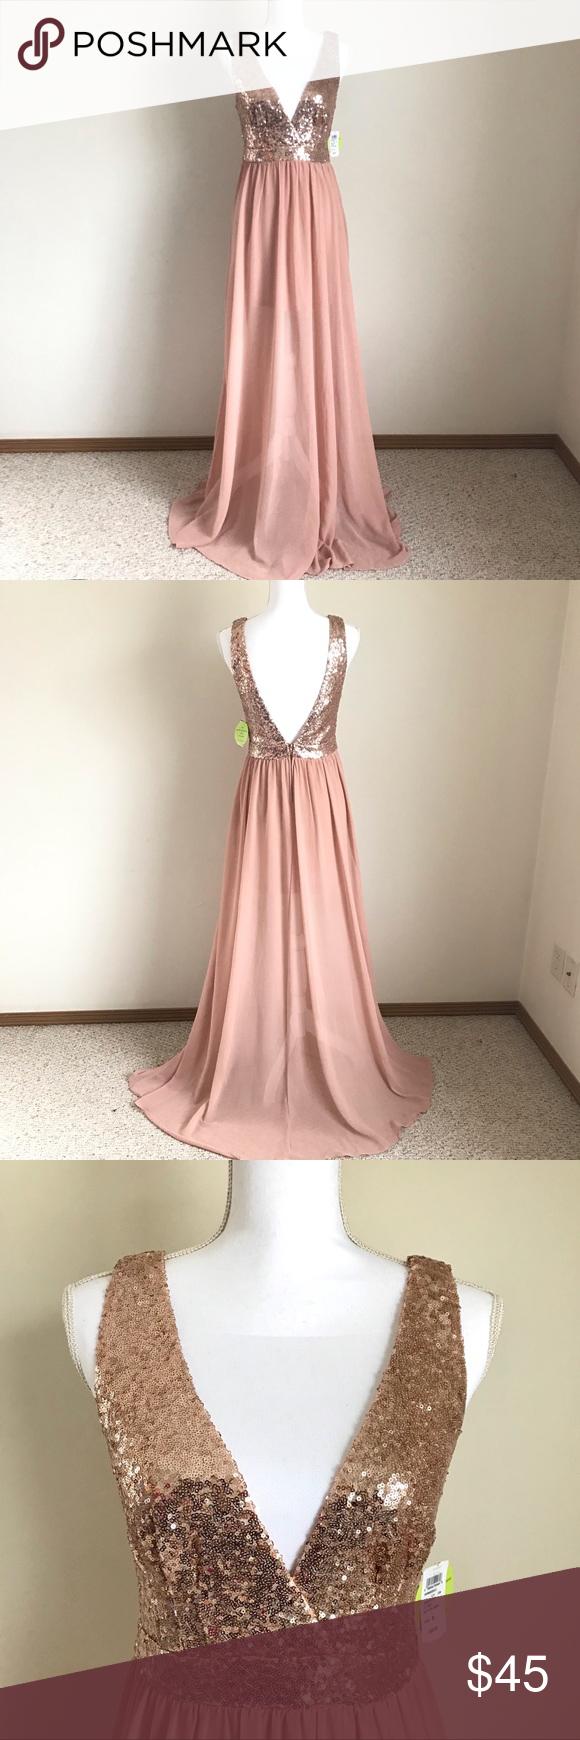 Windsor Champagne Pink Long Dress M Pink Long Dress Long Dress Dresses [ 1740 x 580 Pixel ]